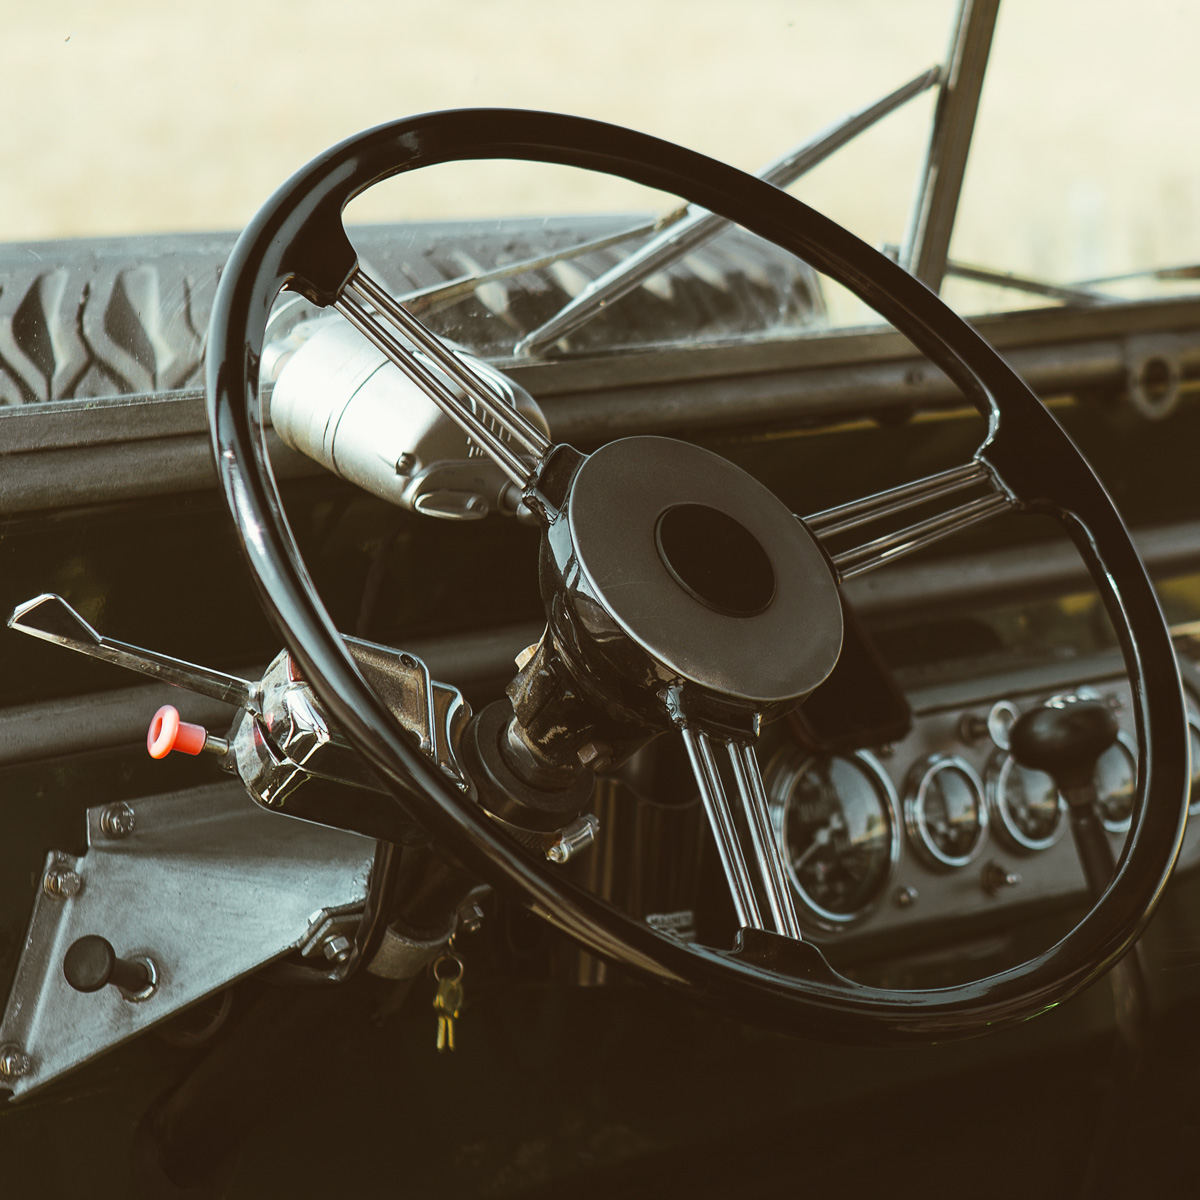 Land_Rover_Series_One_107_Ute_03.jpg